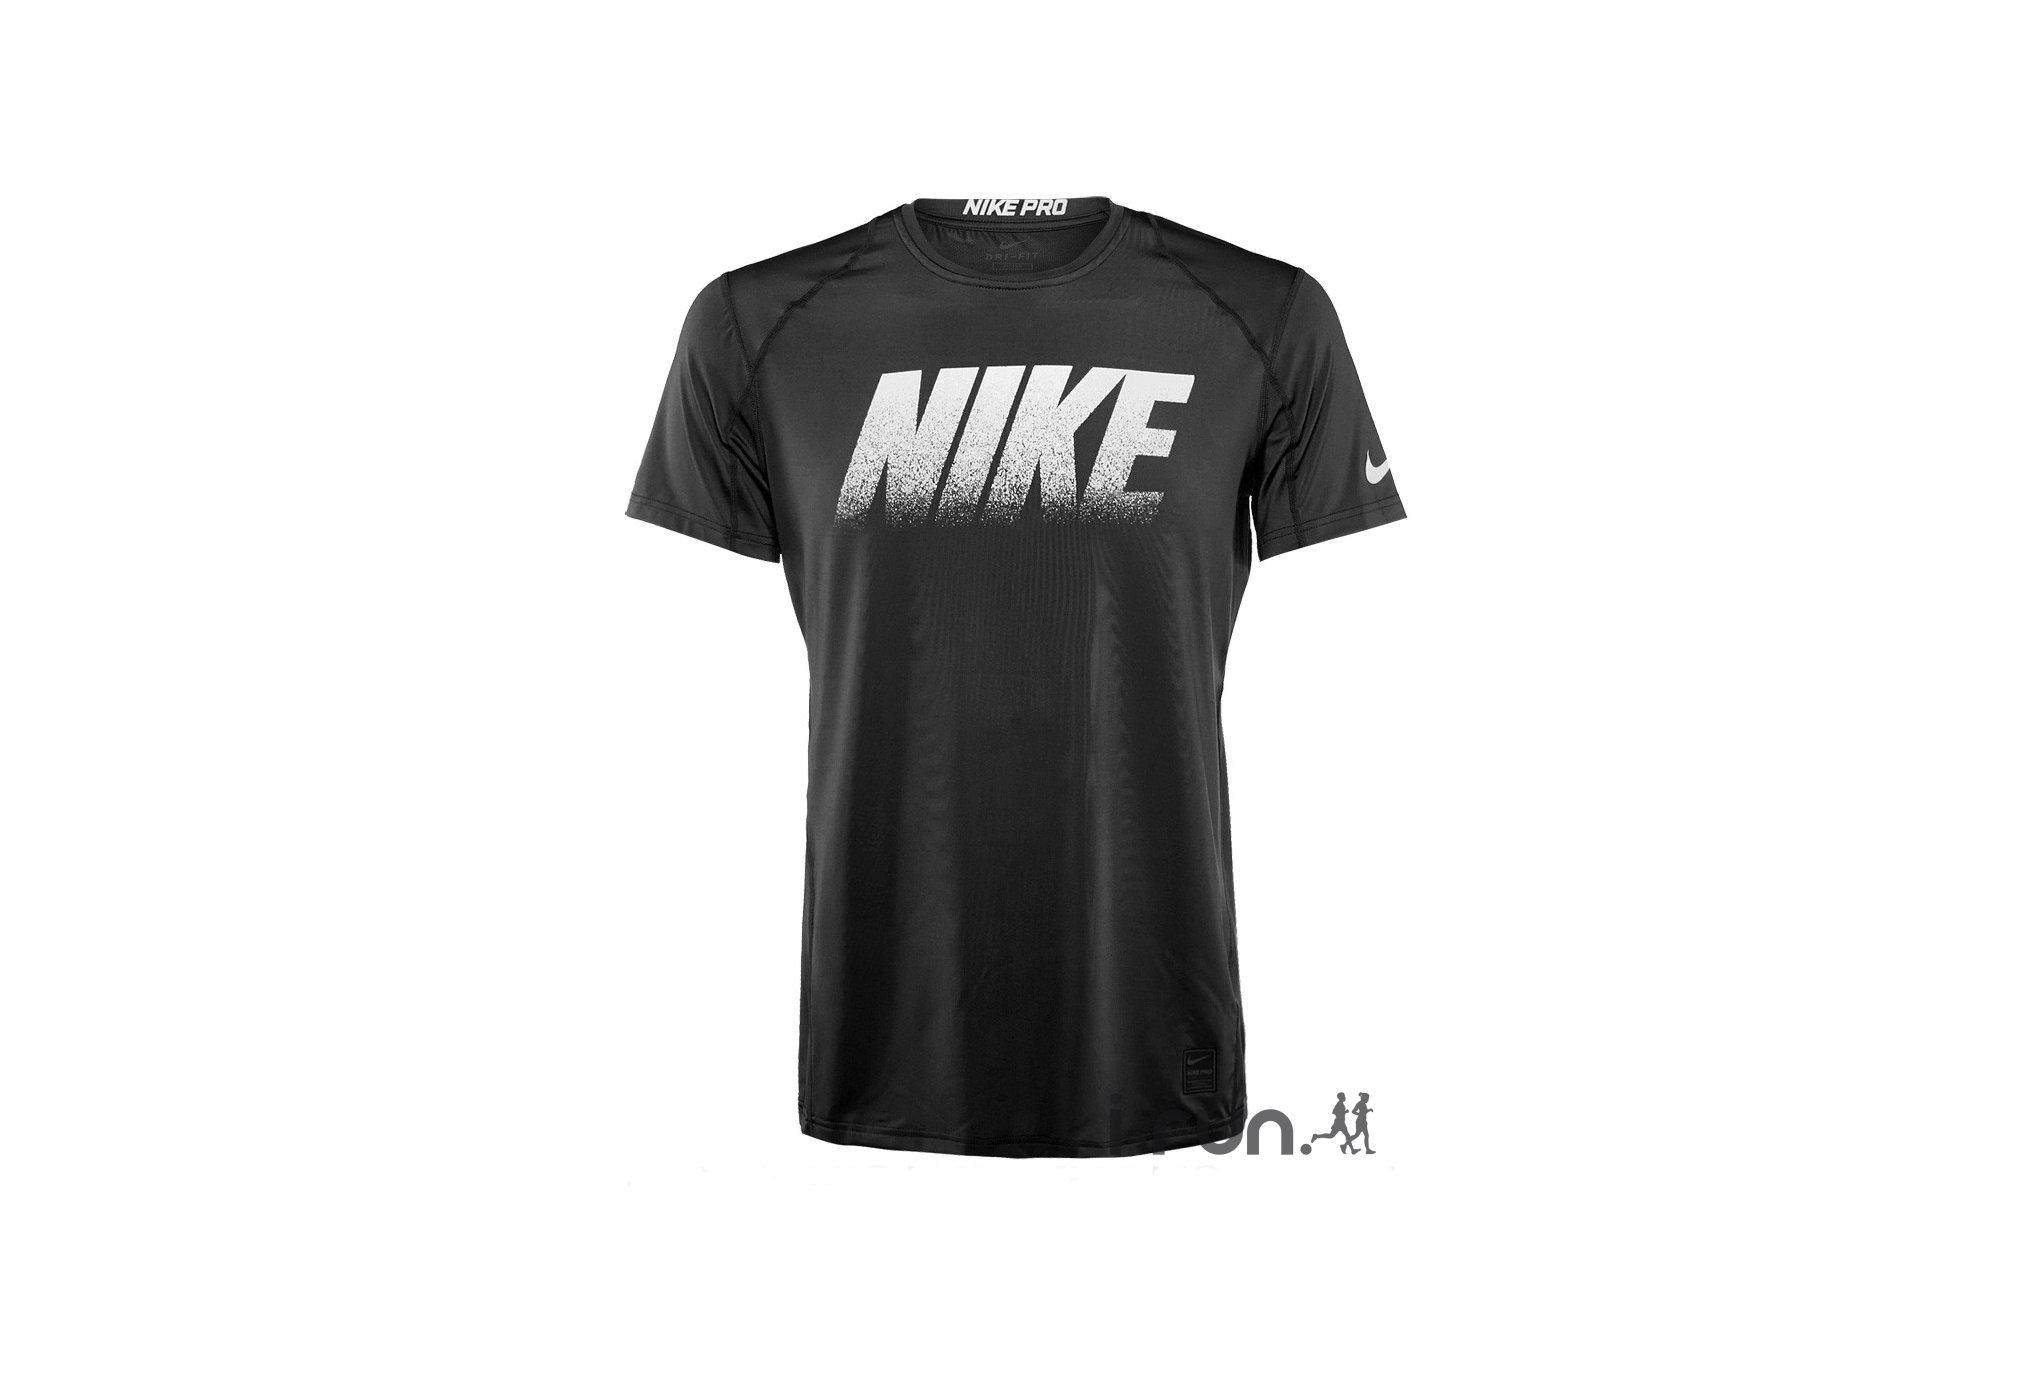 Trail Session - Nike Pro Top M vêtement running homme b3c8cef18e25